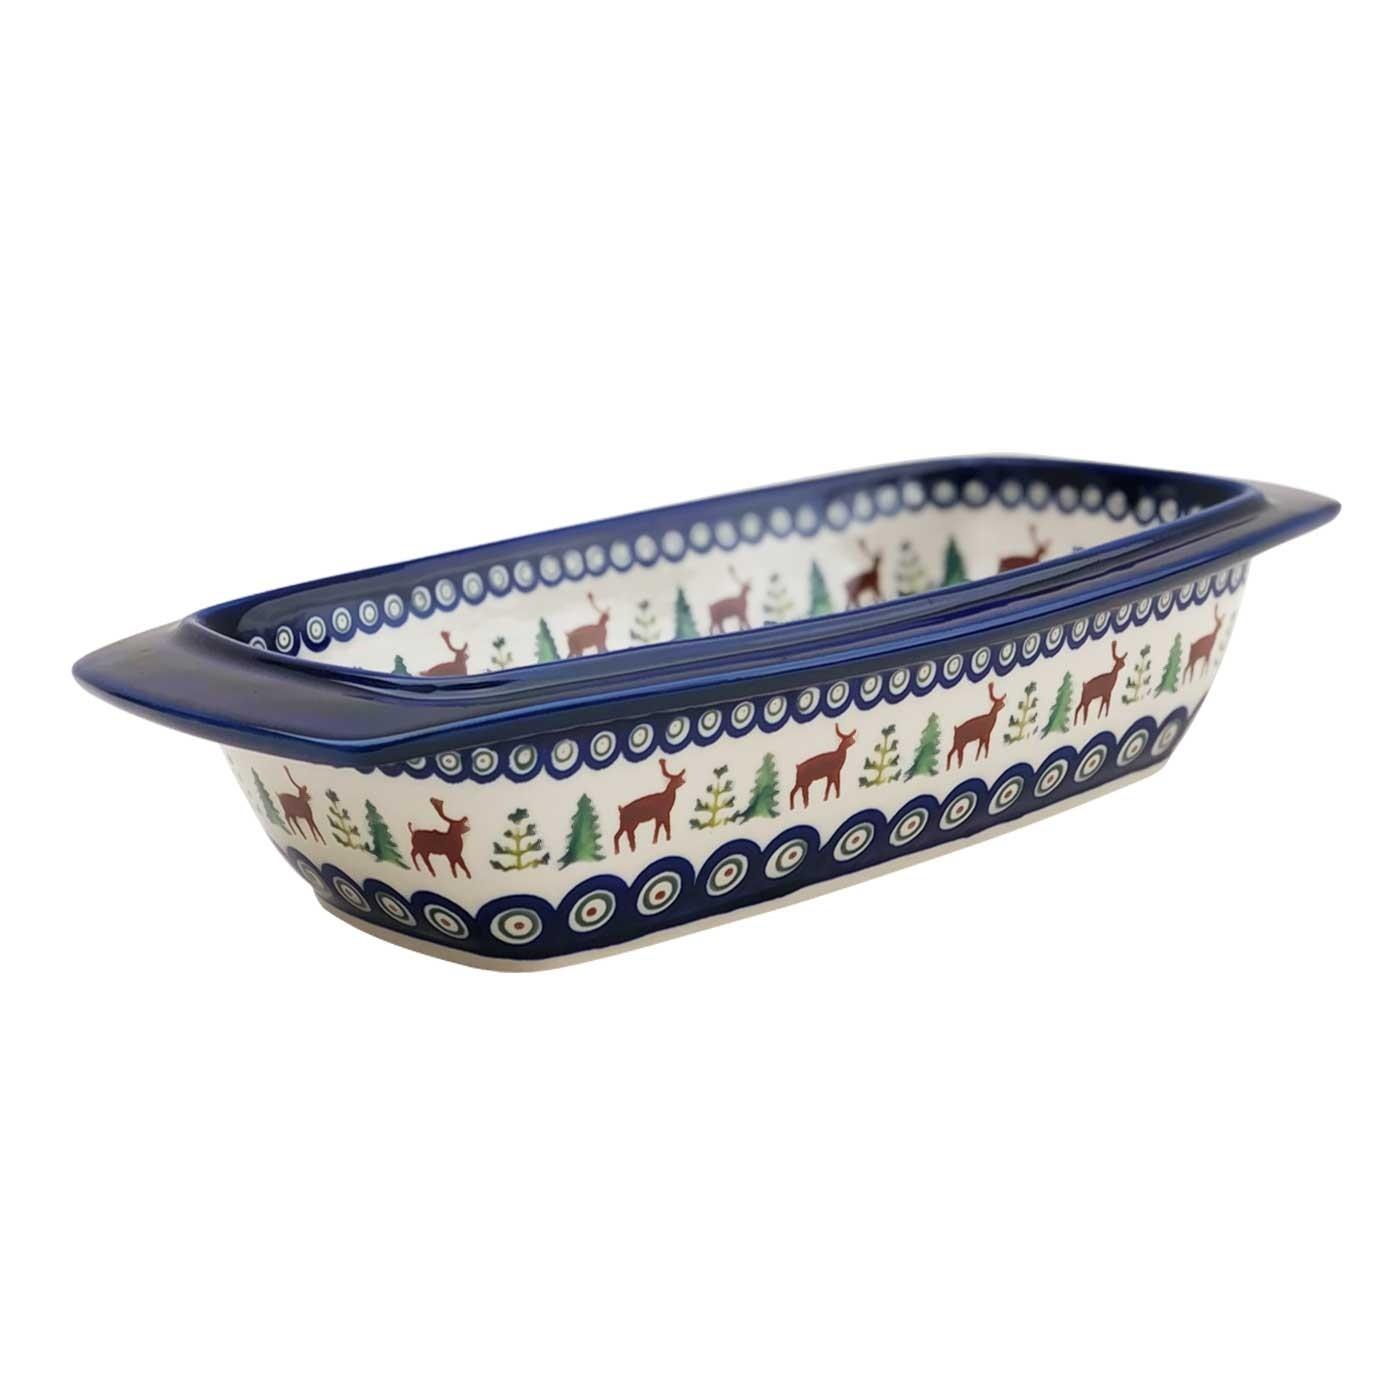 "Pottery Avenue Caribou Lodge 17"" Rectangular Stoneware Baker | Serving Dish"